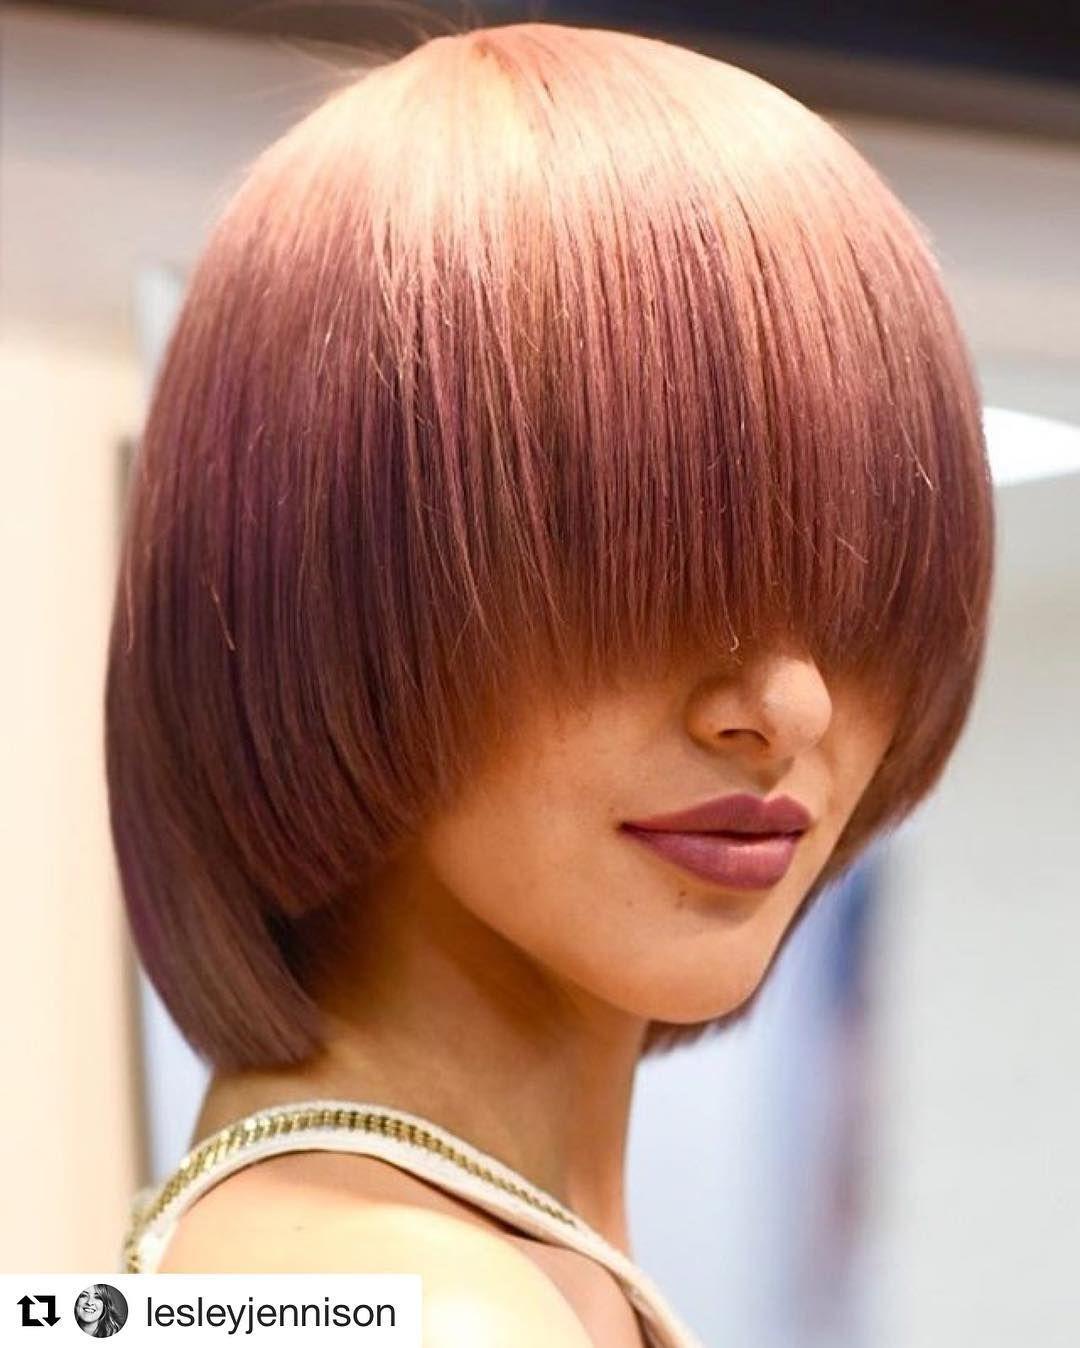 So Hot Long Hair Girl Pageboy Haircut Mushroom Hair